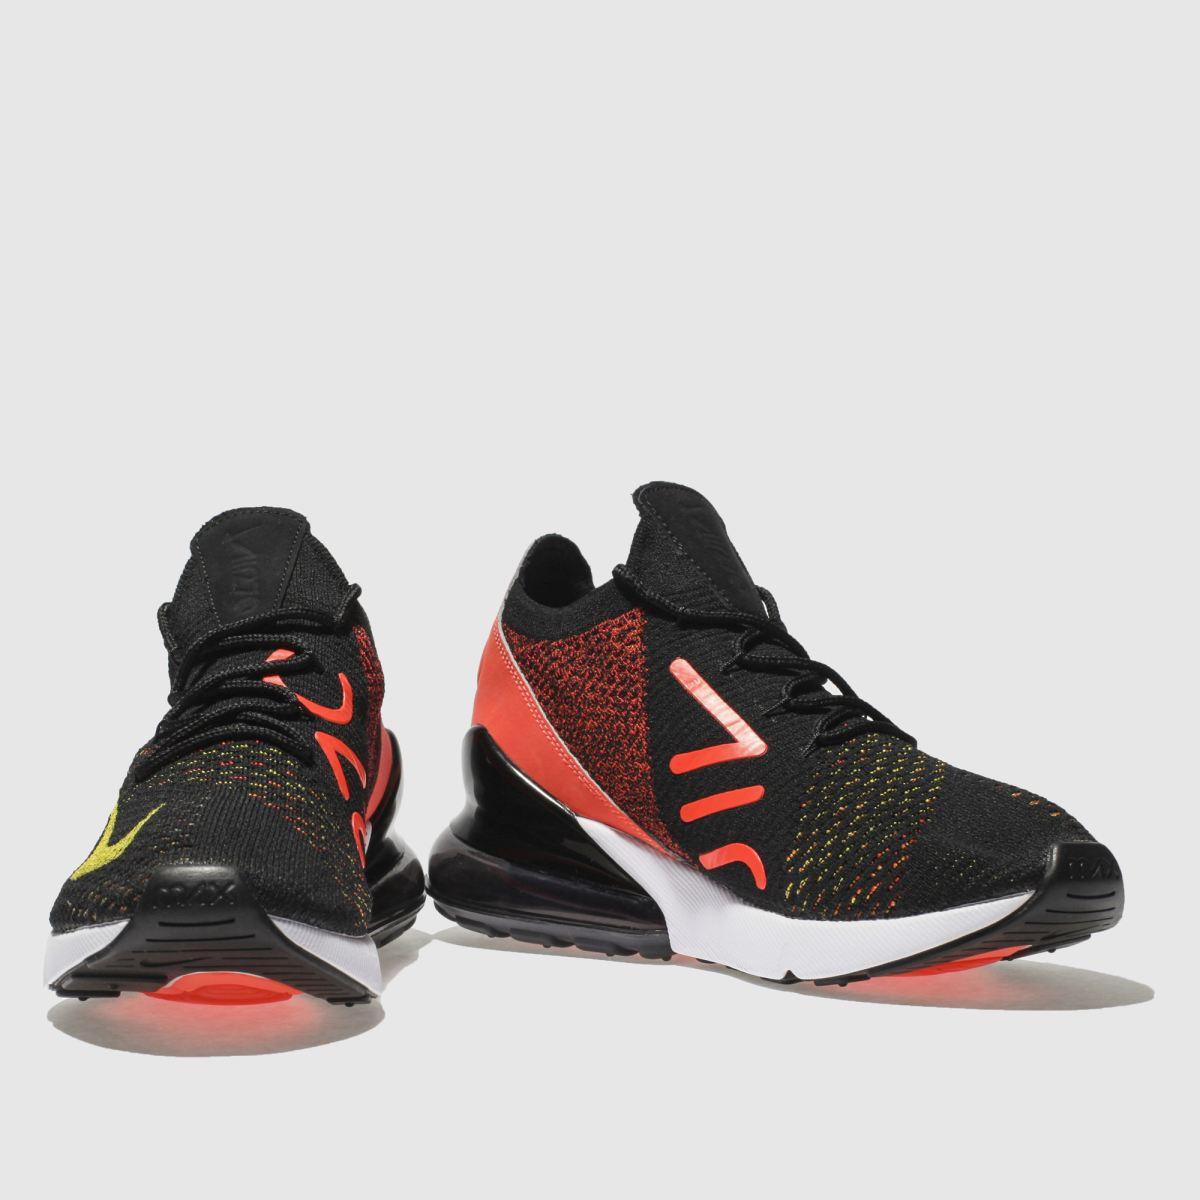 Damen Schwarz-pink nike Air Max 270 Flyknit Sneaker | schuh Gute Qualität beliebte Schuhe